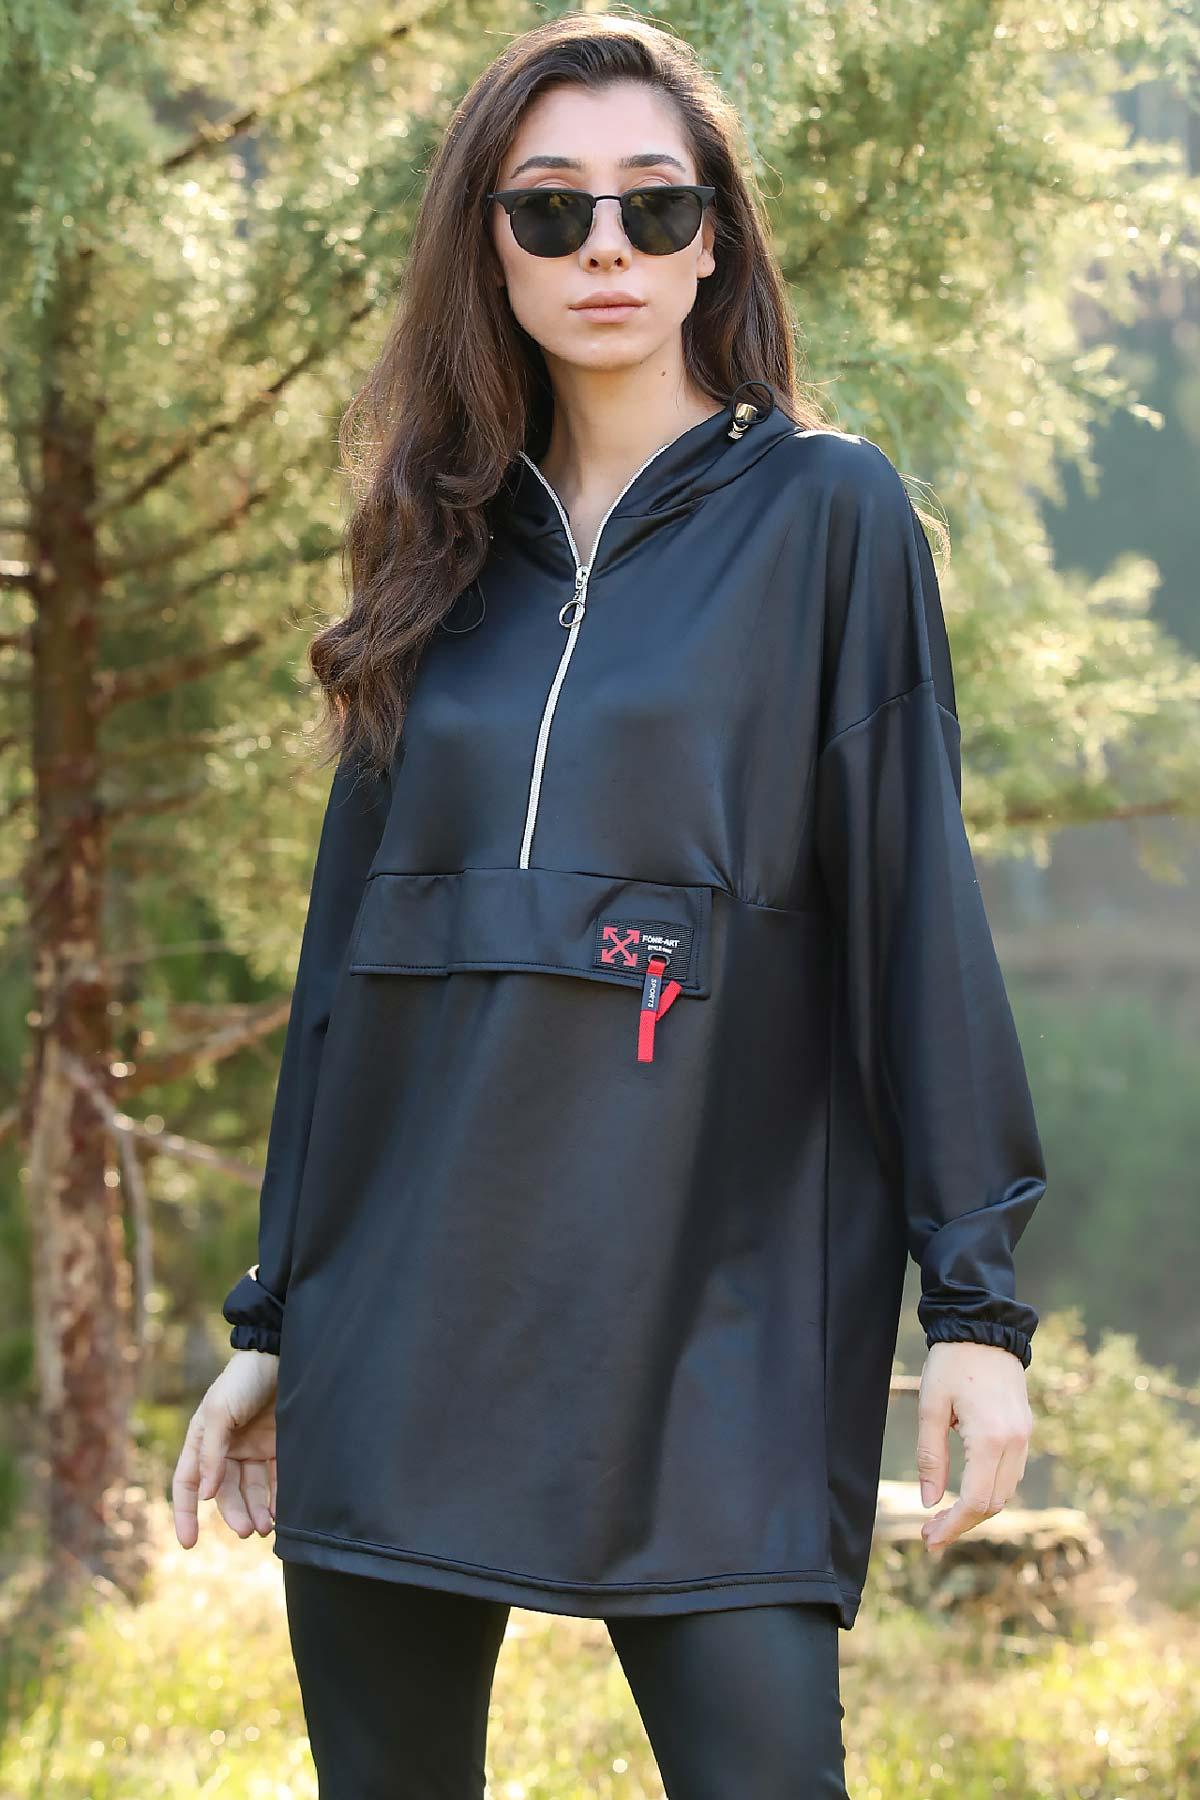 Women's Hooded Shiny Black Sweatshirt